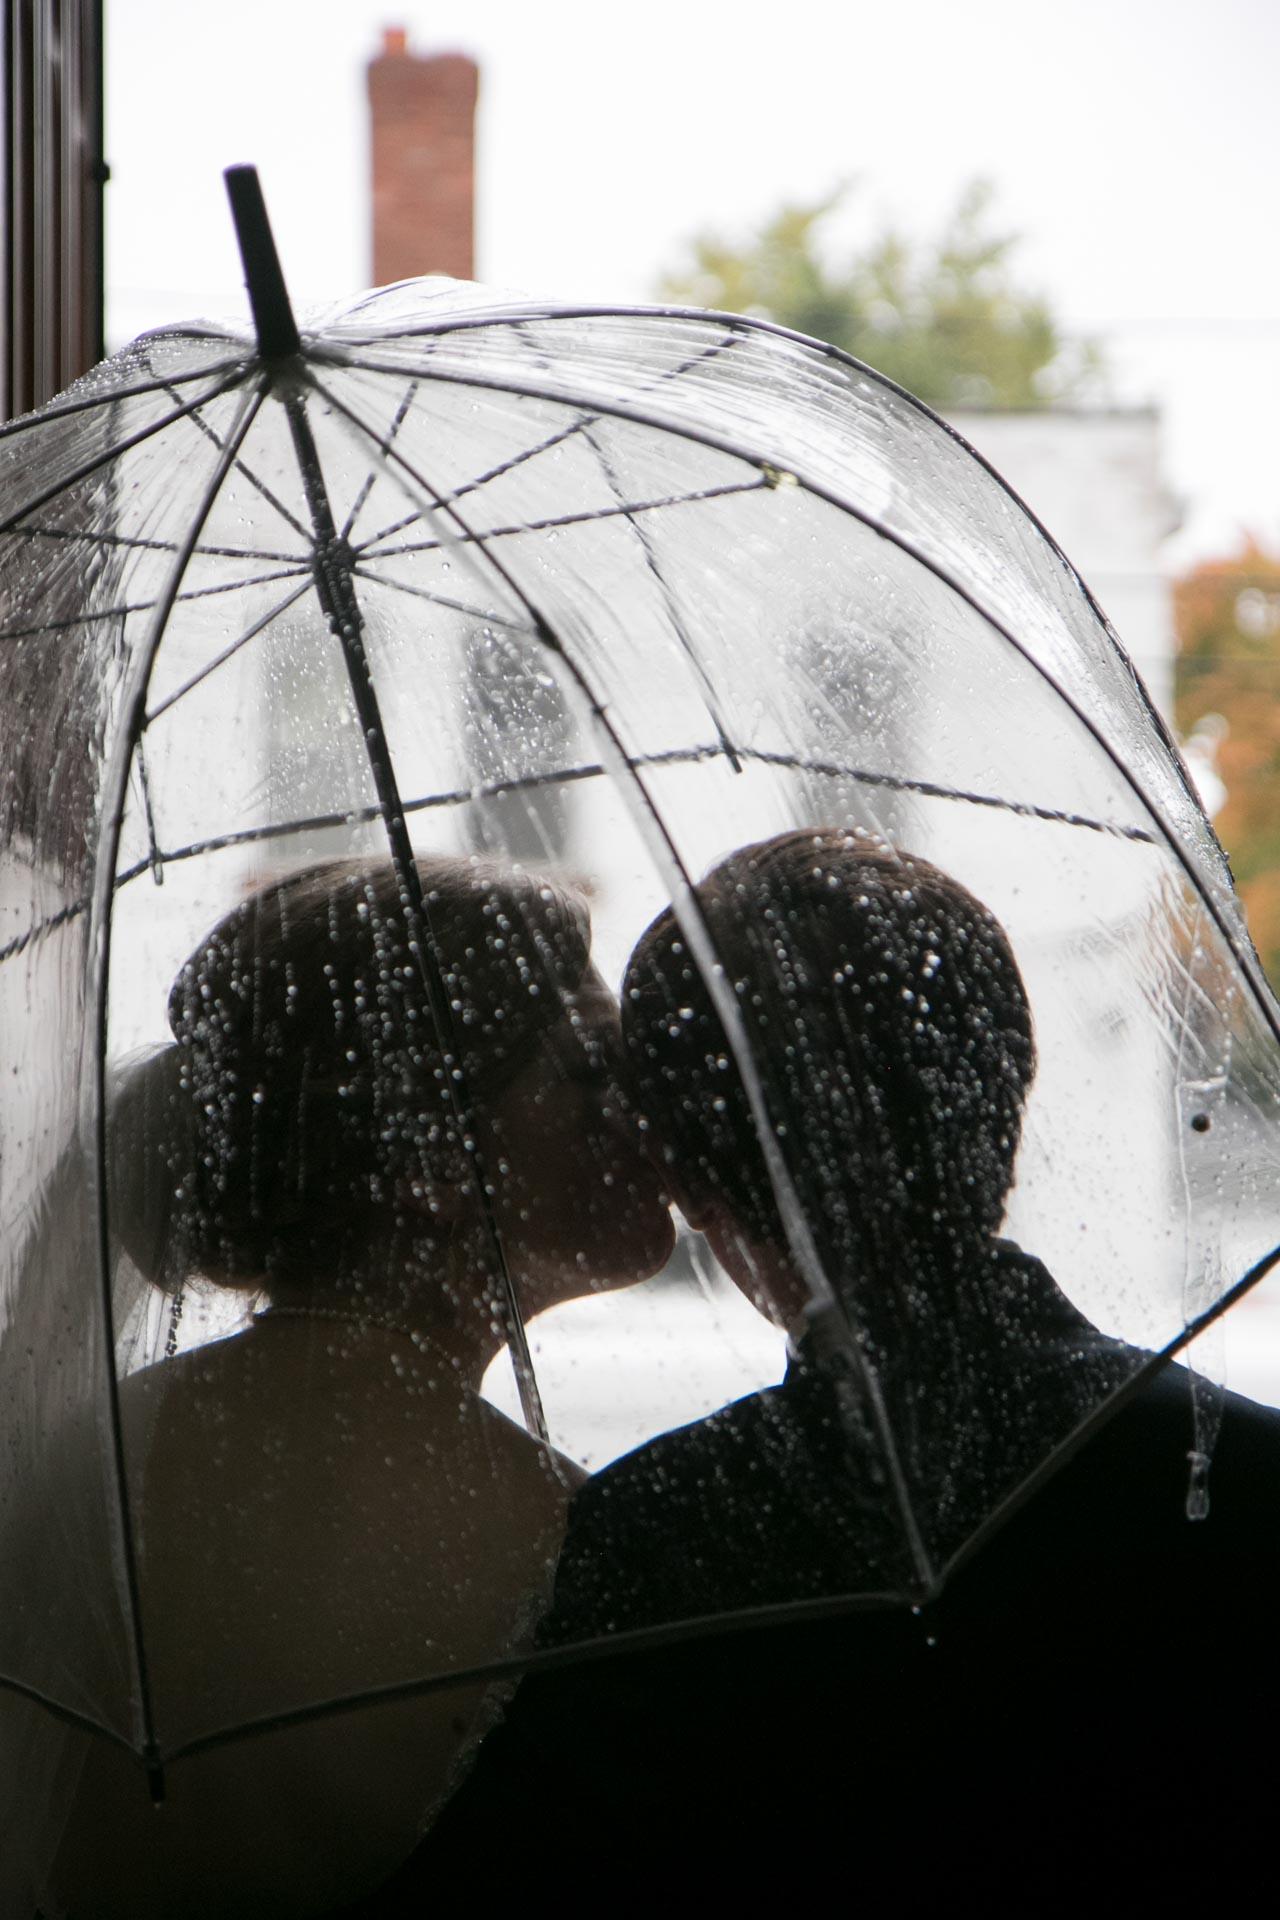 rain-inclement-weather-snow-adam-shea-photography-green-bay-appleton-neenah-photographer-14.jpg